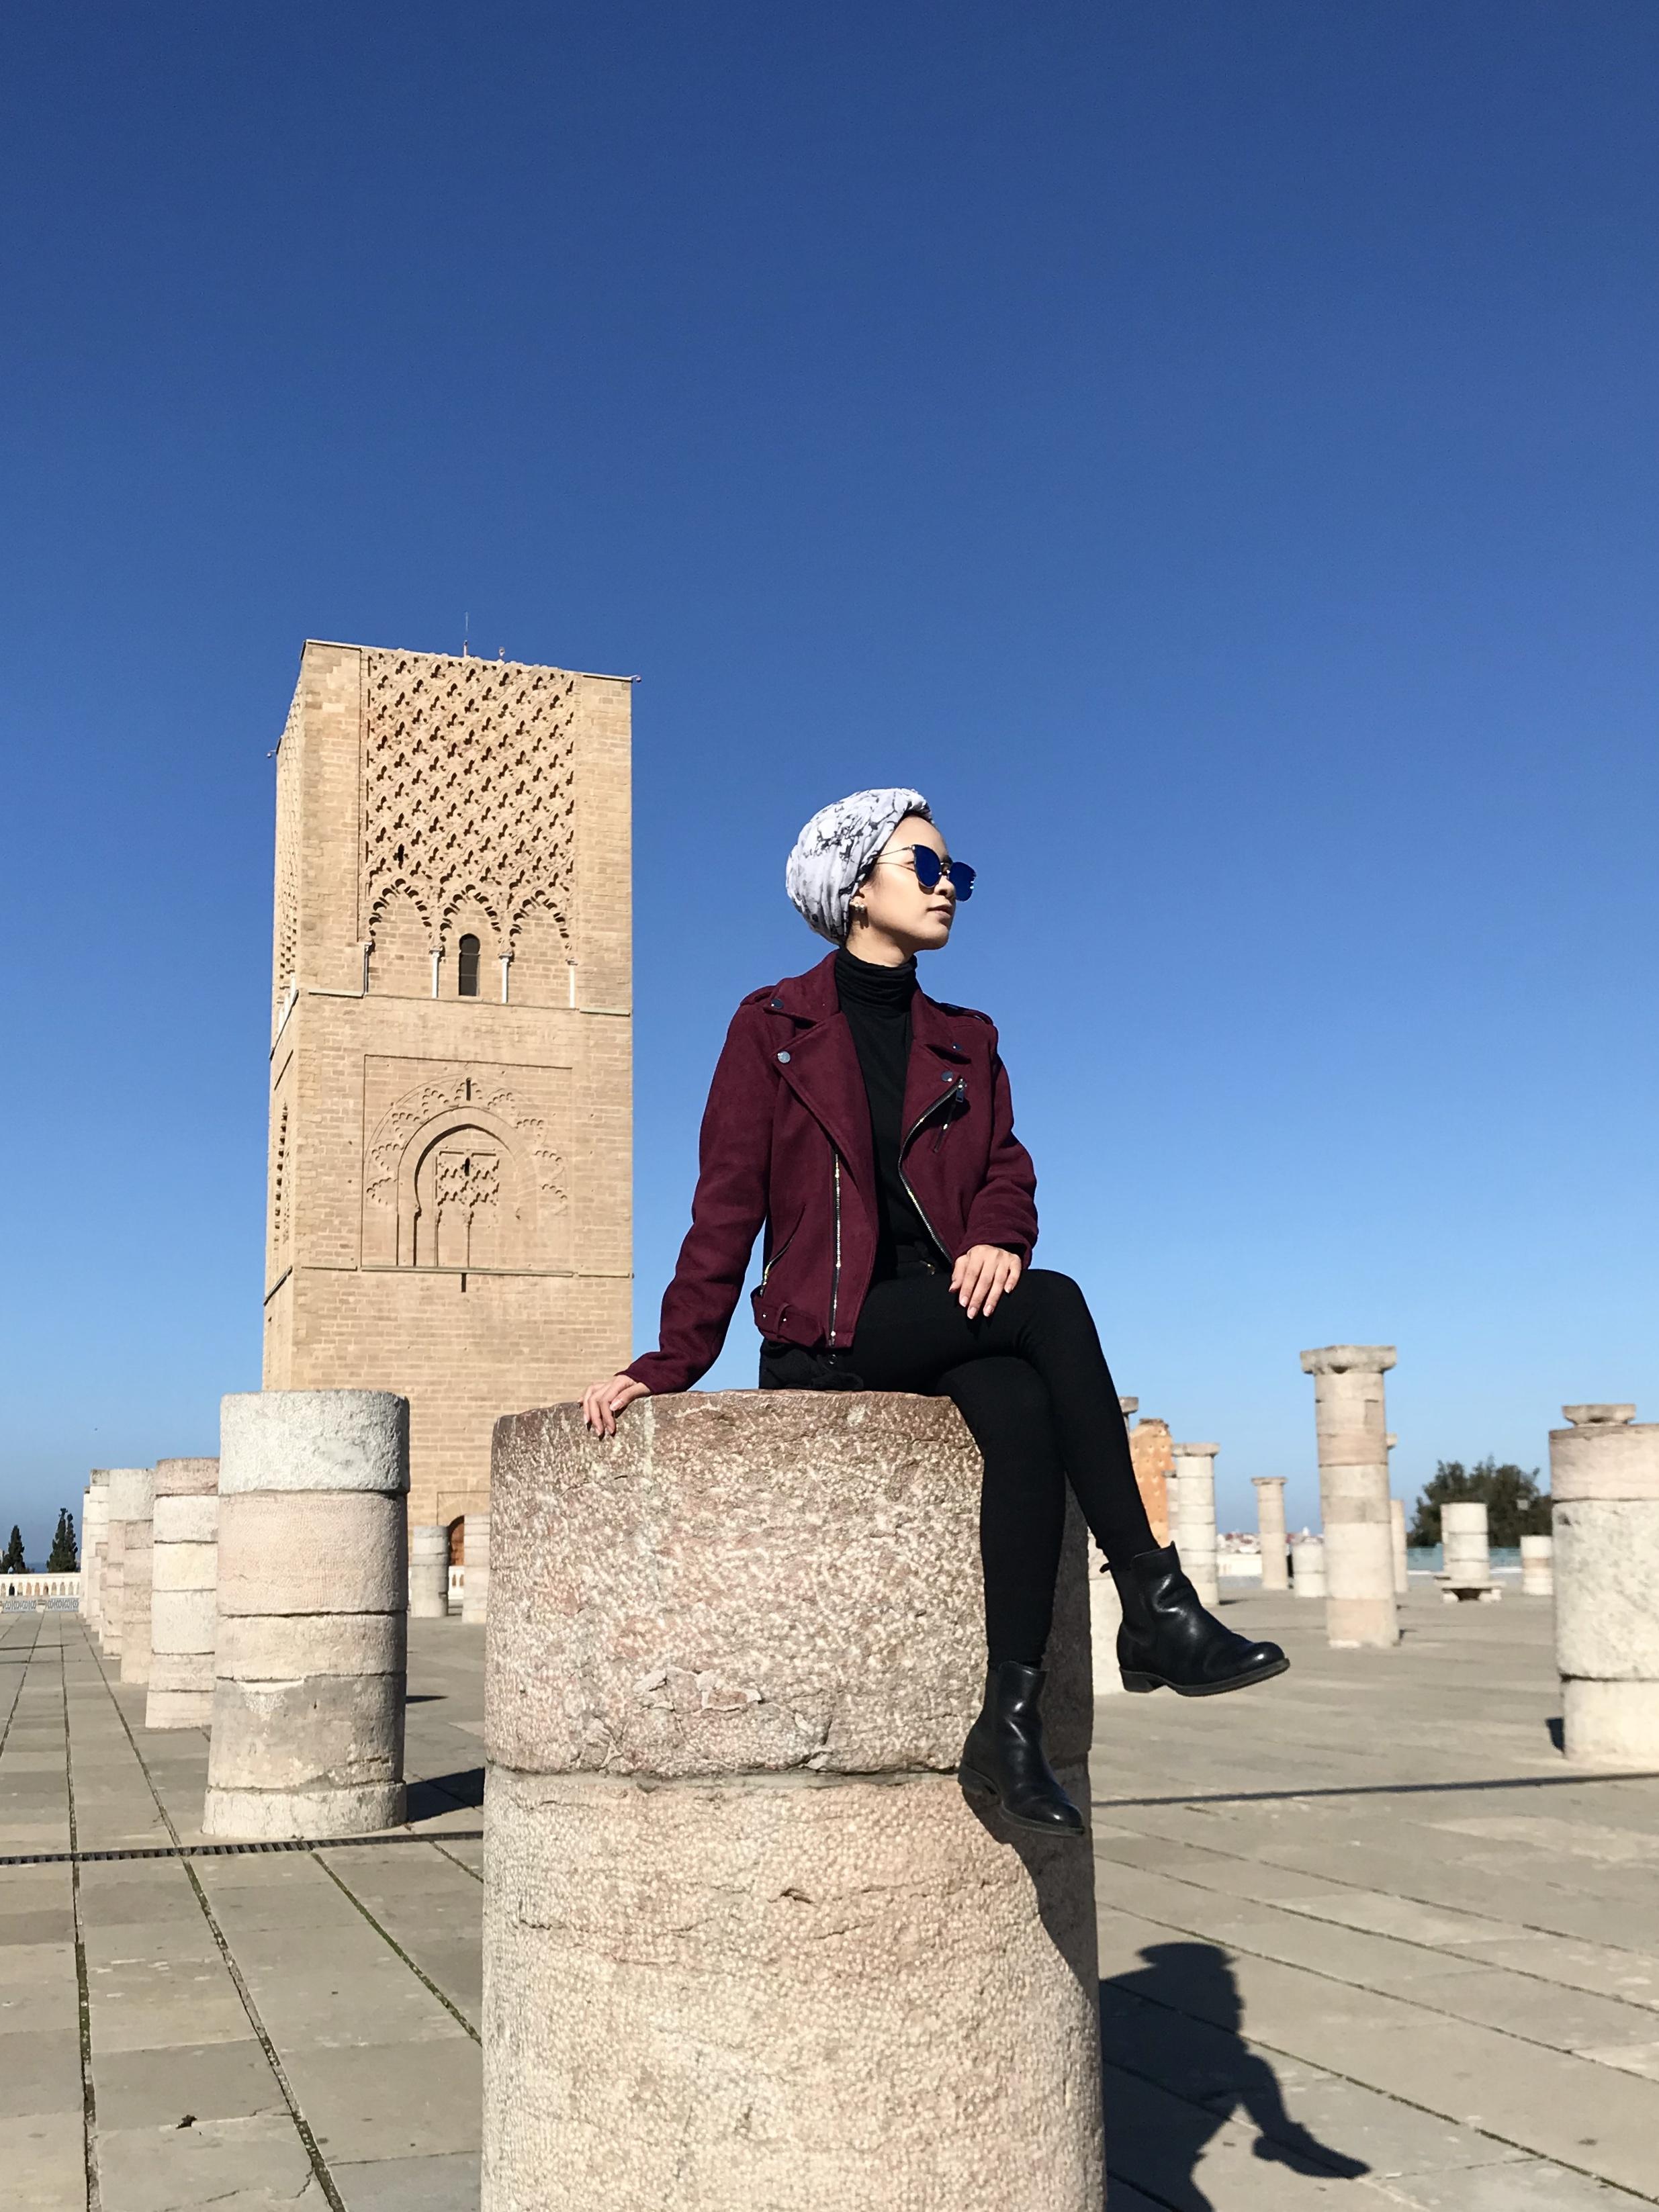 Morocco, 2017